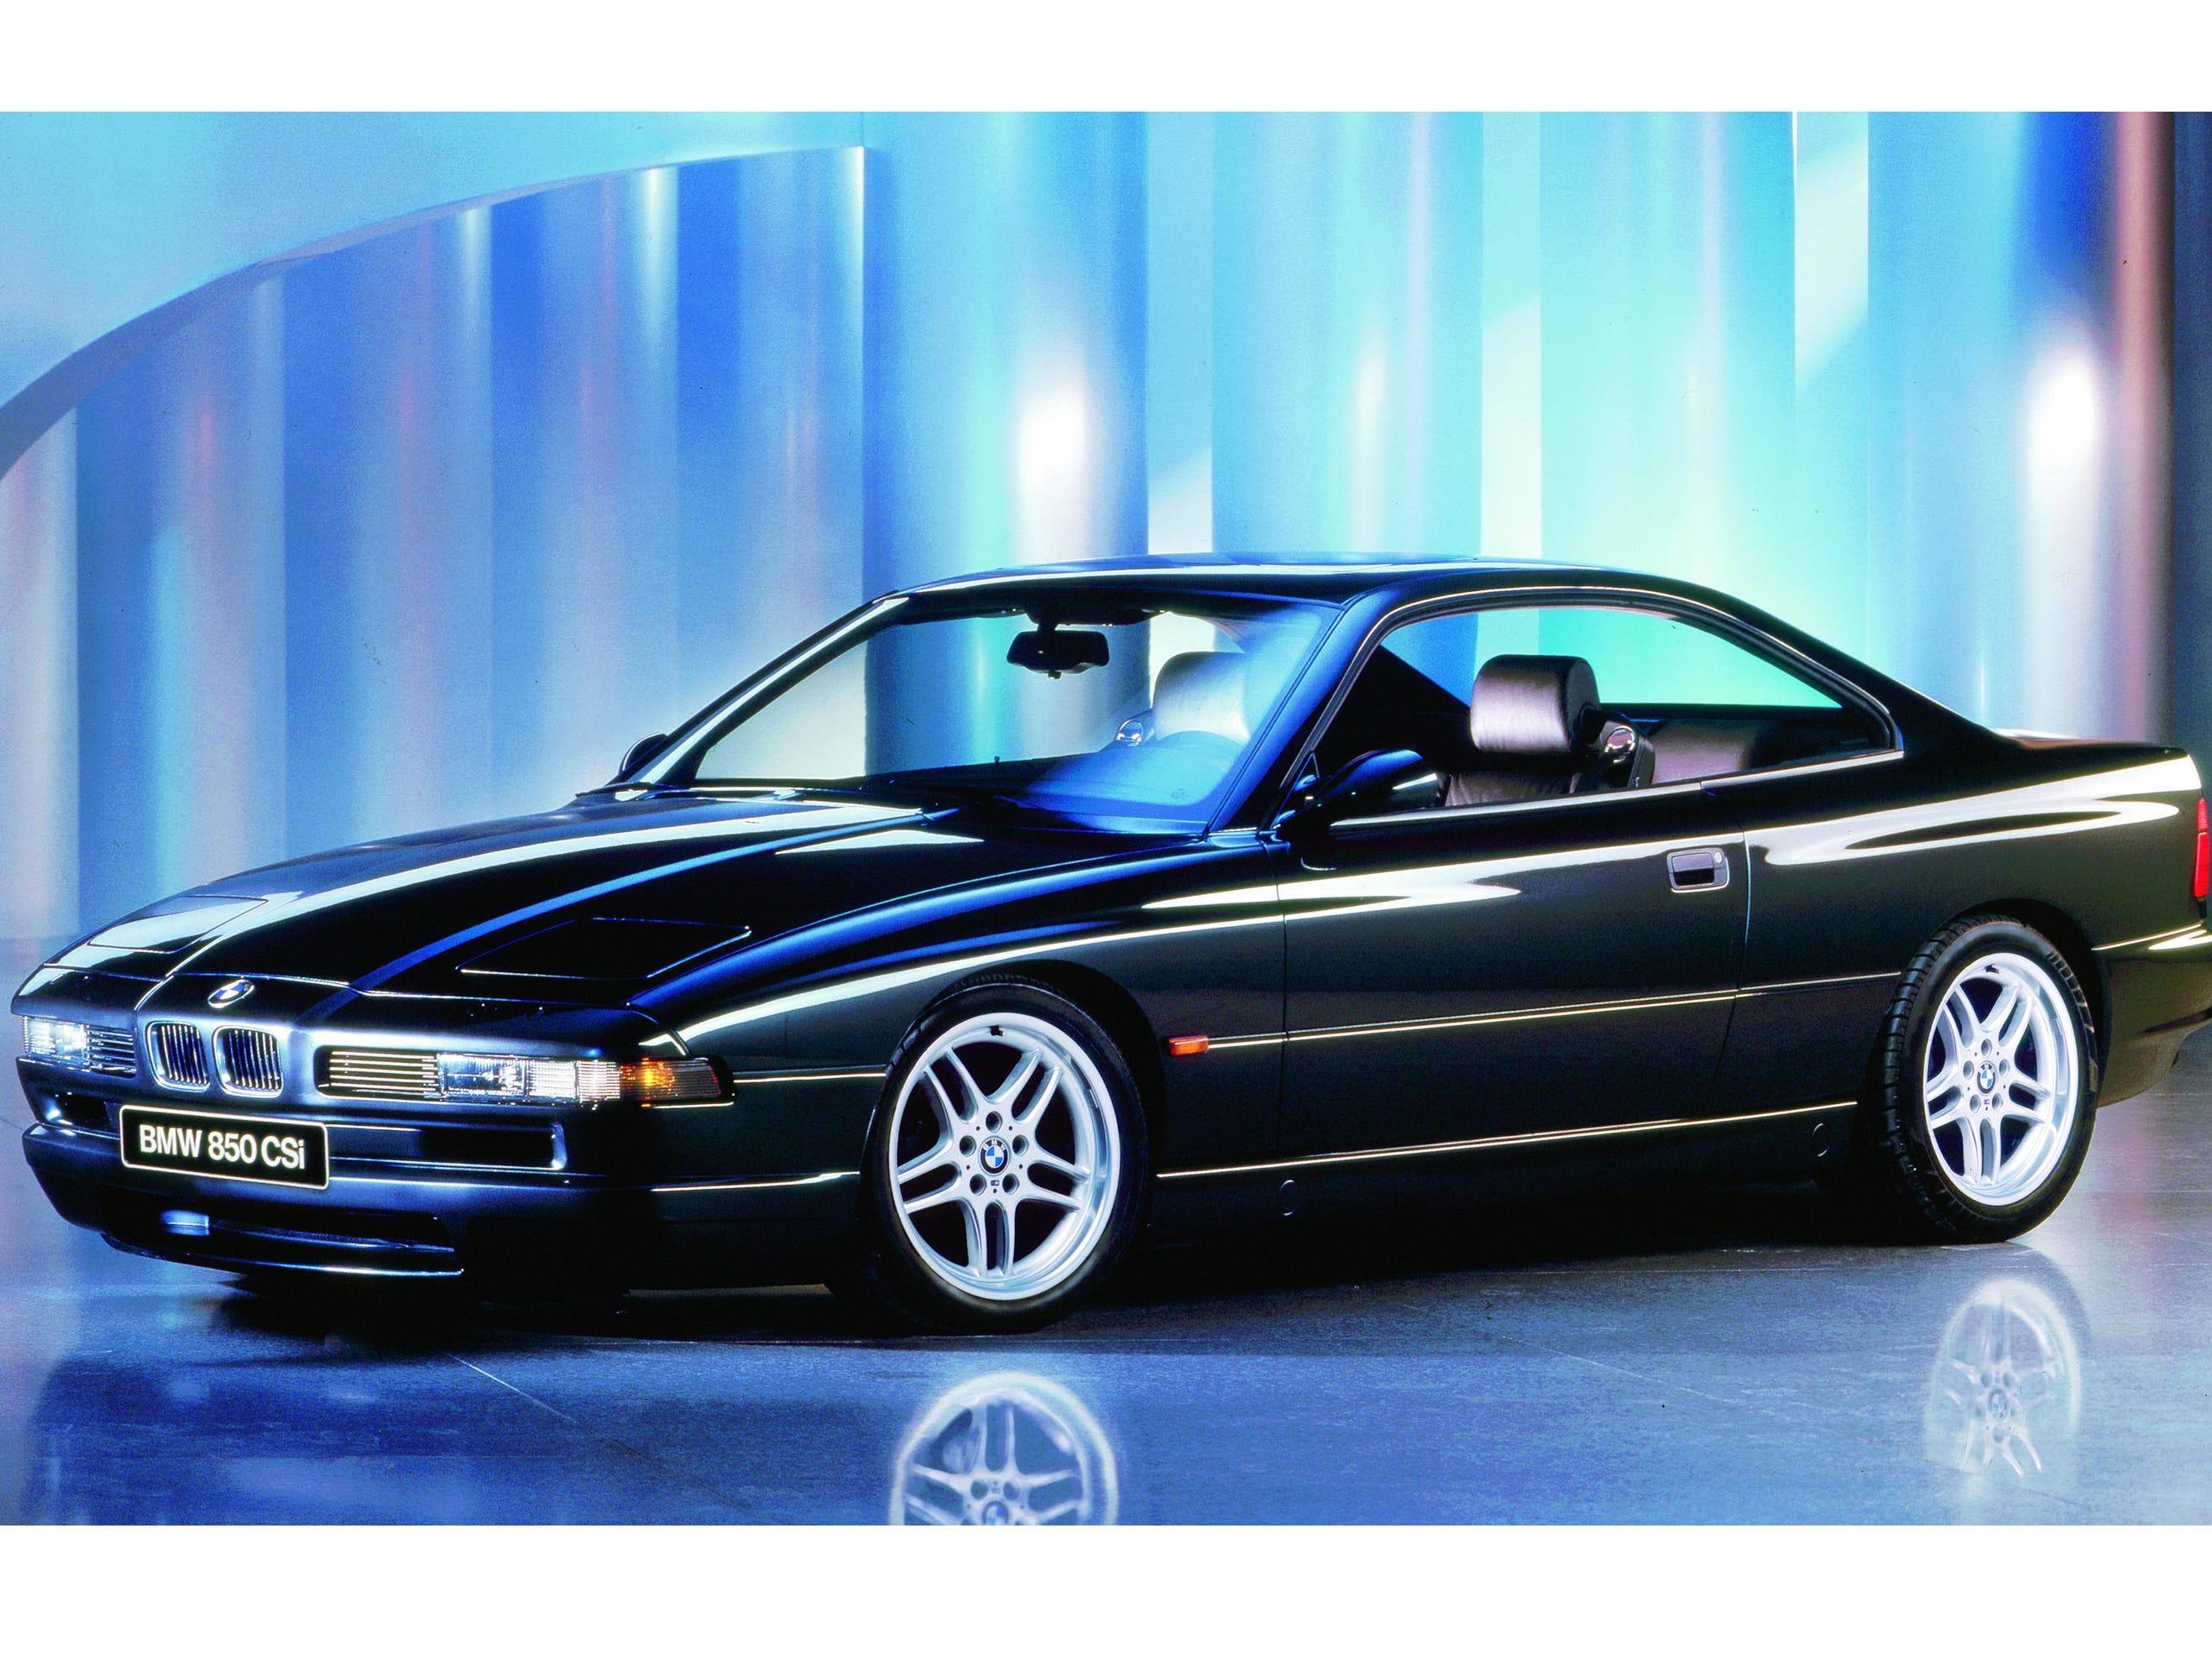 The 1992-96 BMW 850 CSI.